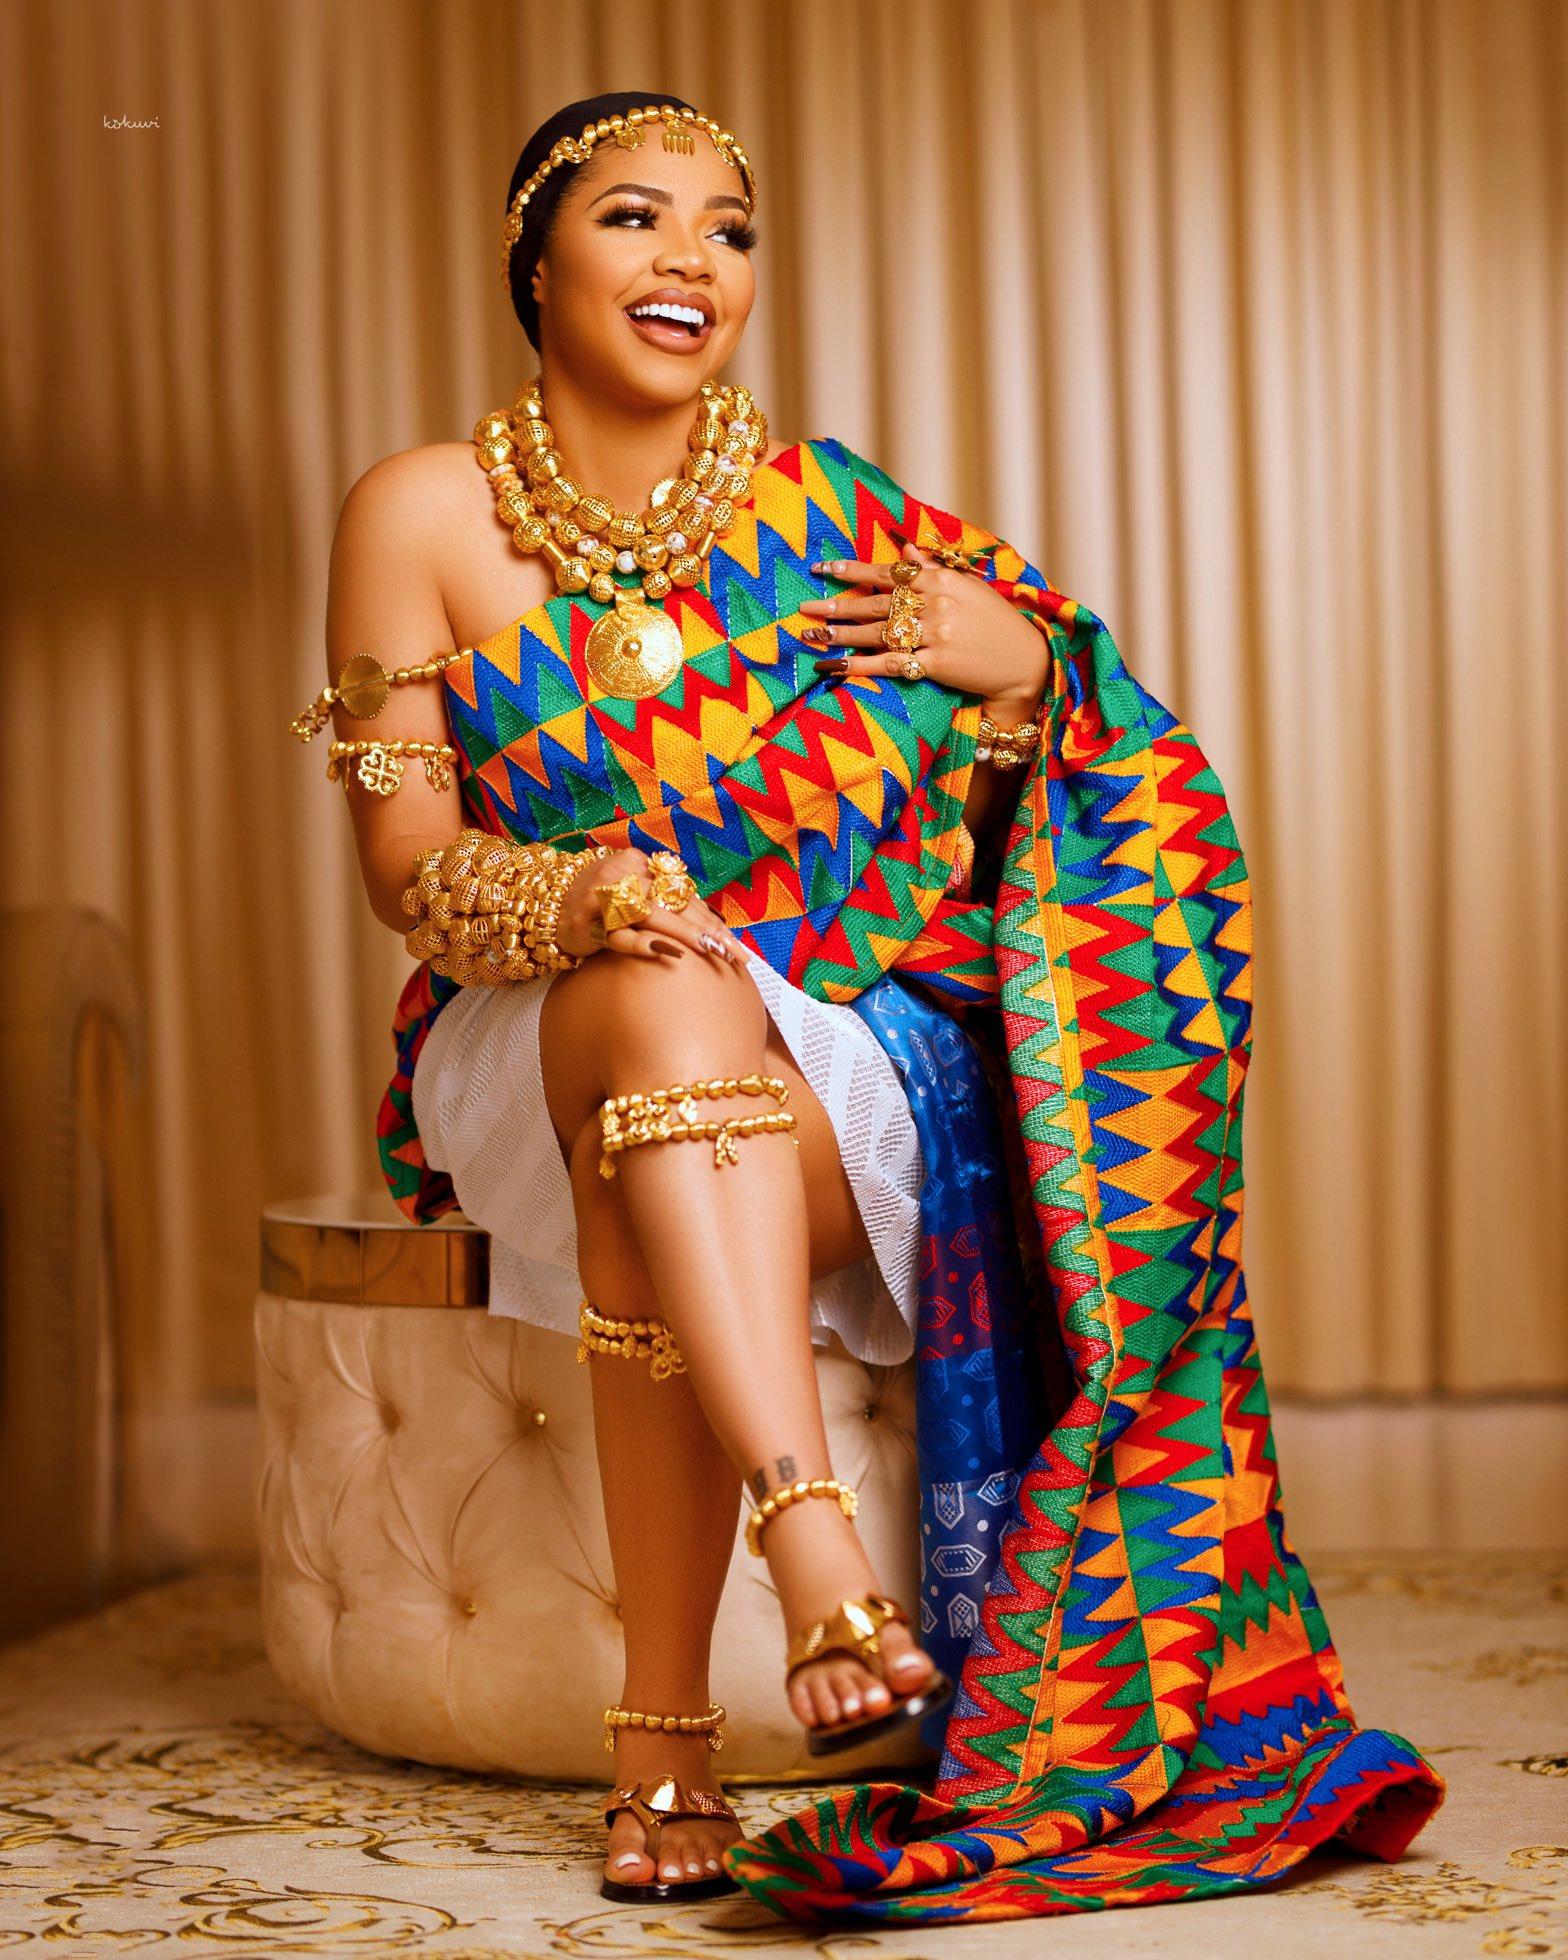 BBNaija's Nengi Celebrates Ghana's Independence (Photos)